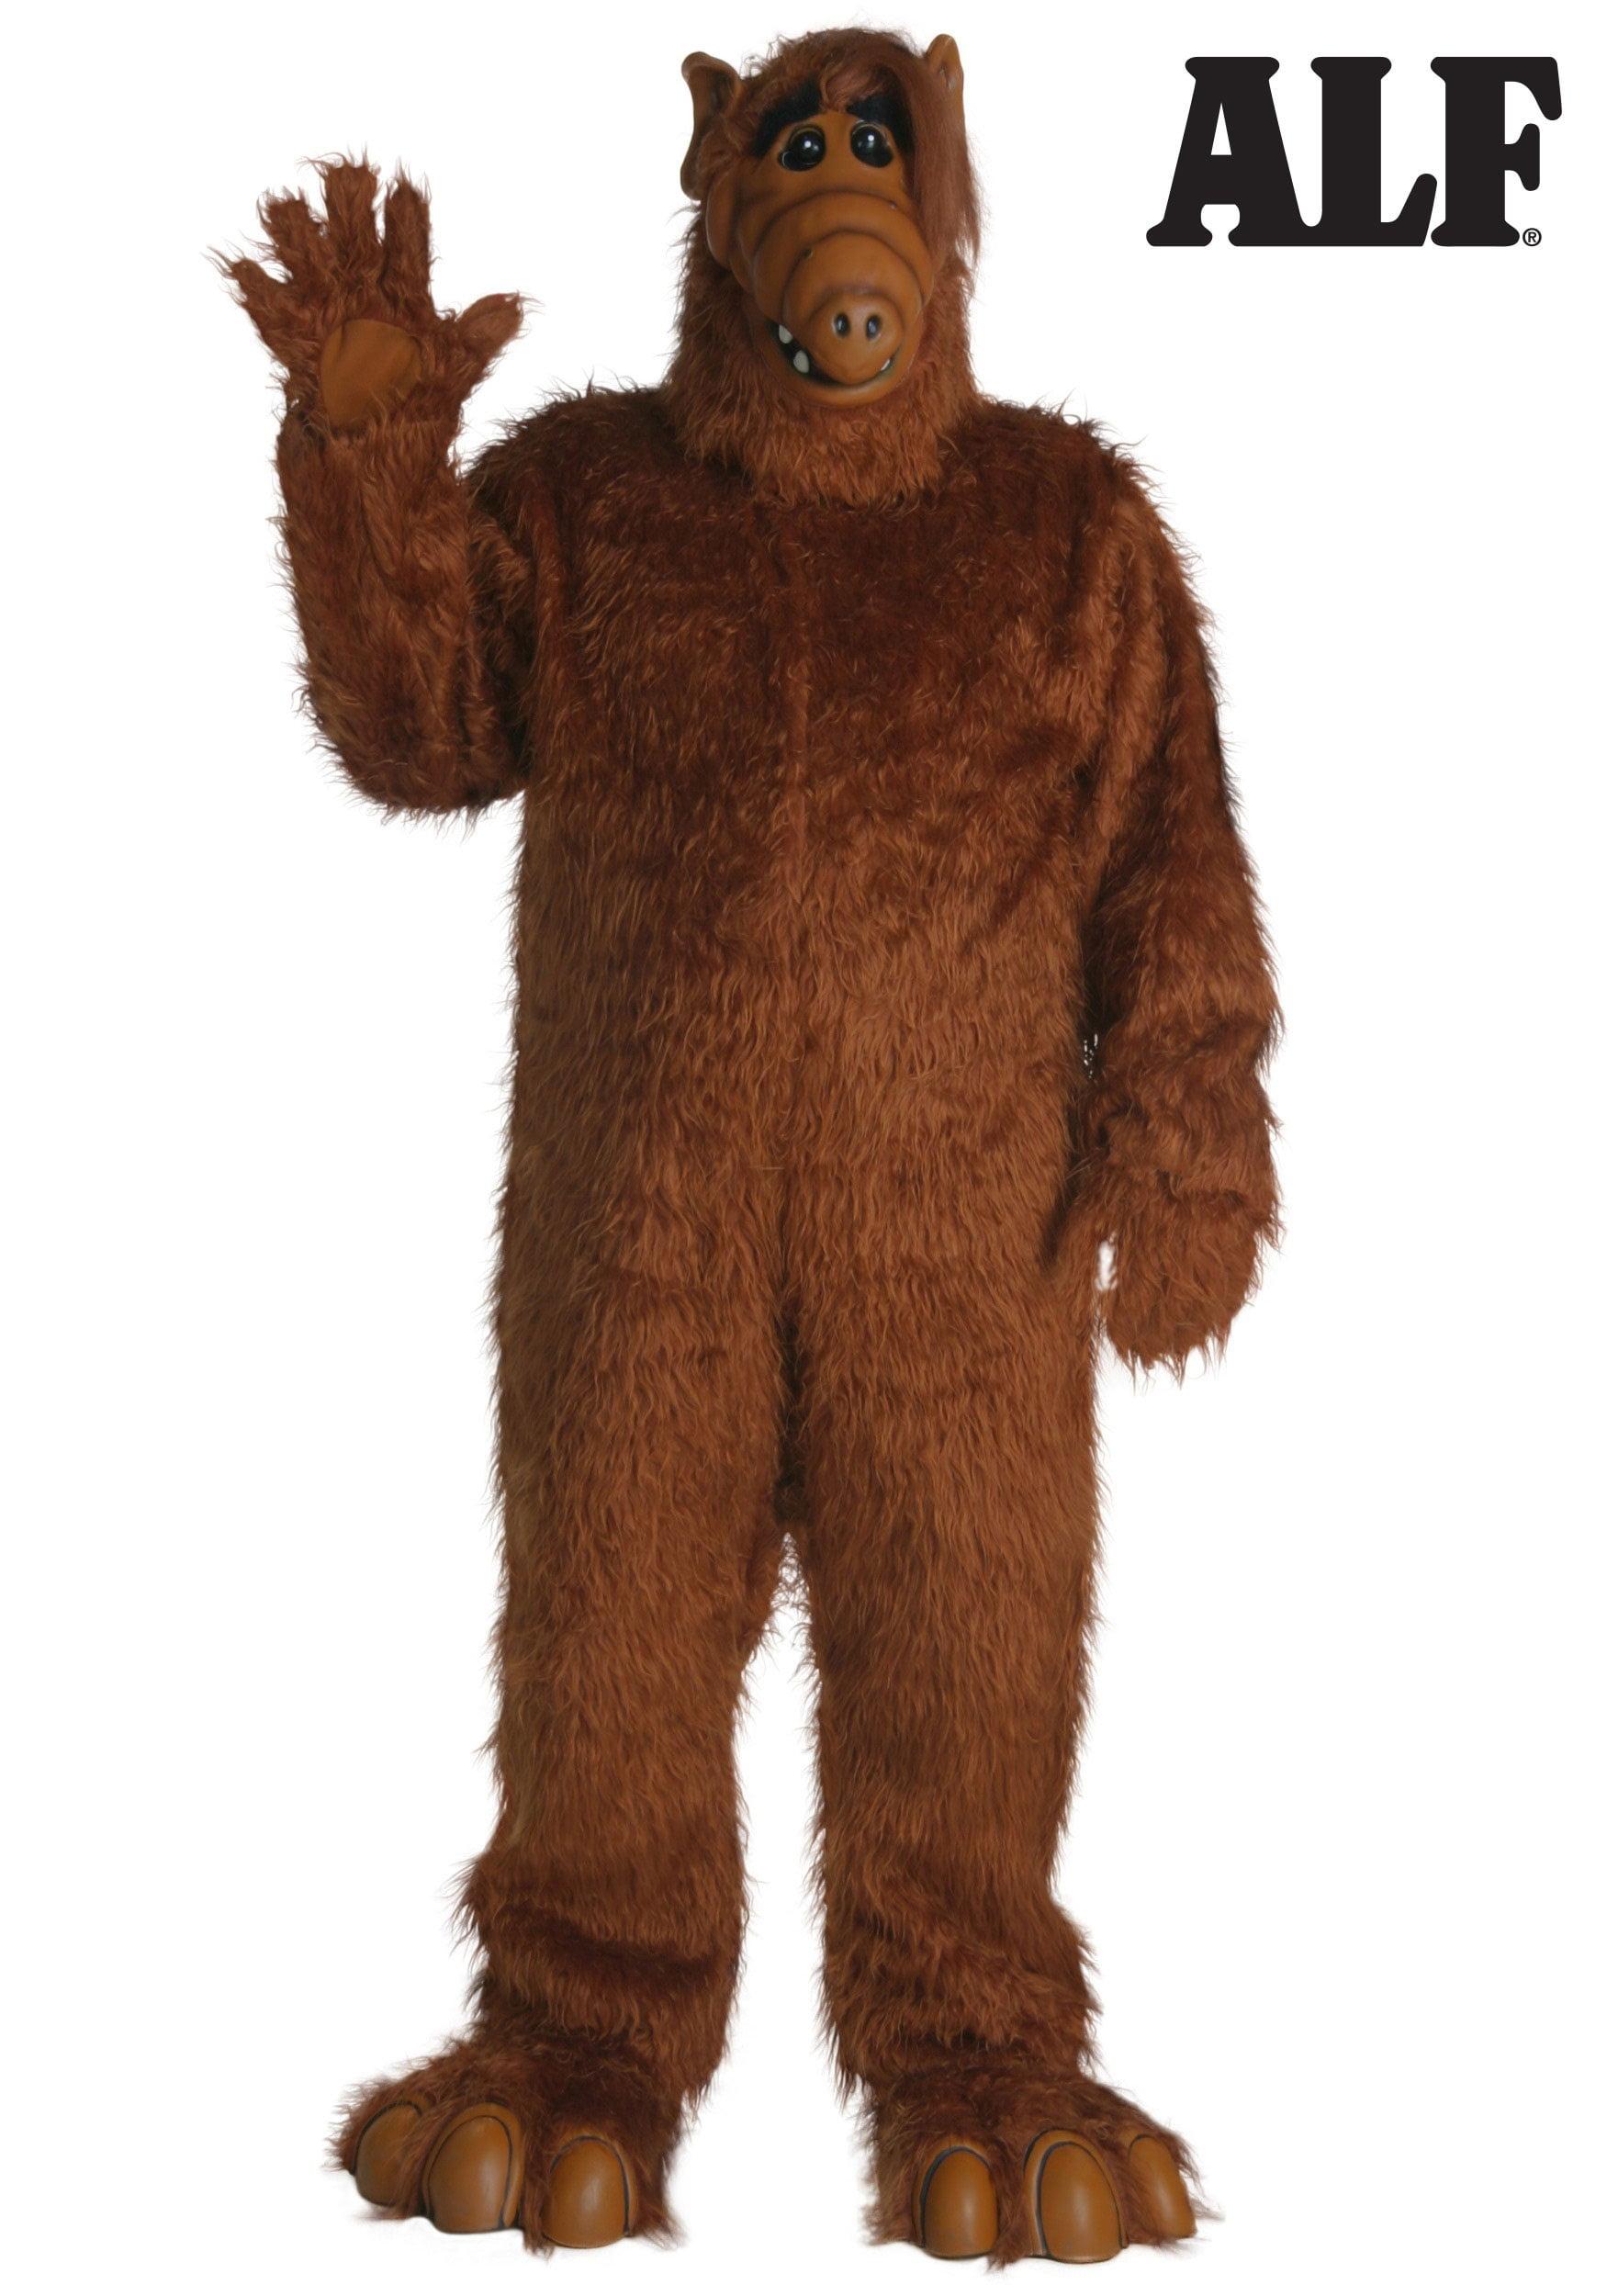 sc 1 st  Walmart & Plus Size Alf Costume - Walmart.com